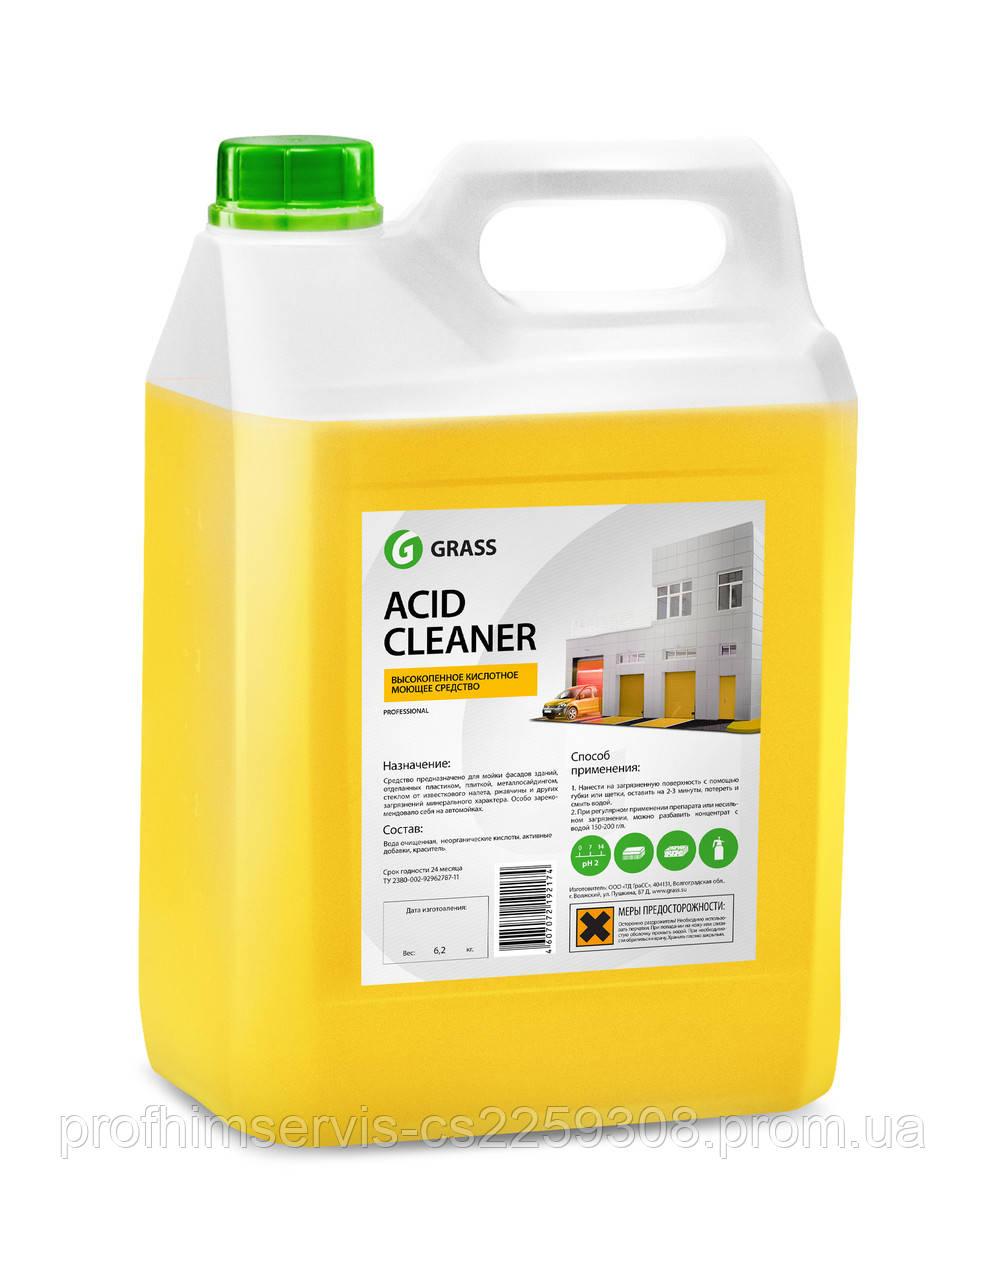 Grass ACID CLEANER Средство для мойки фасадов, пластика, кафеля, керамогранита 5,9 кг.